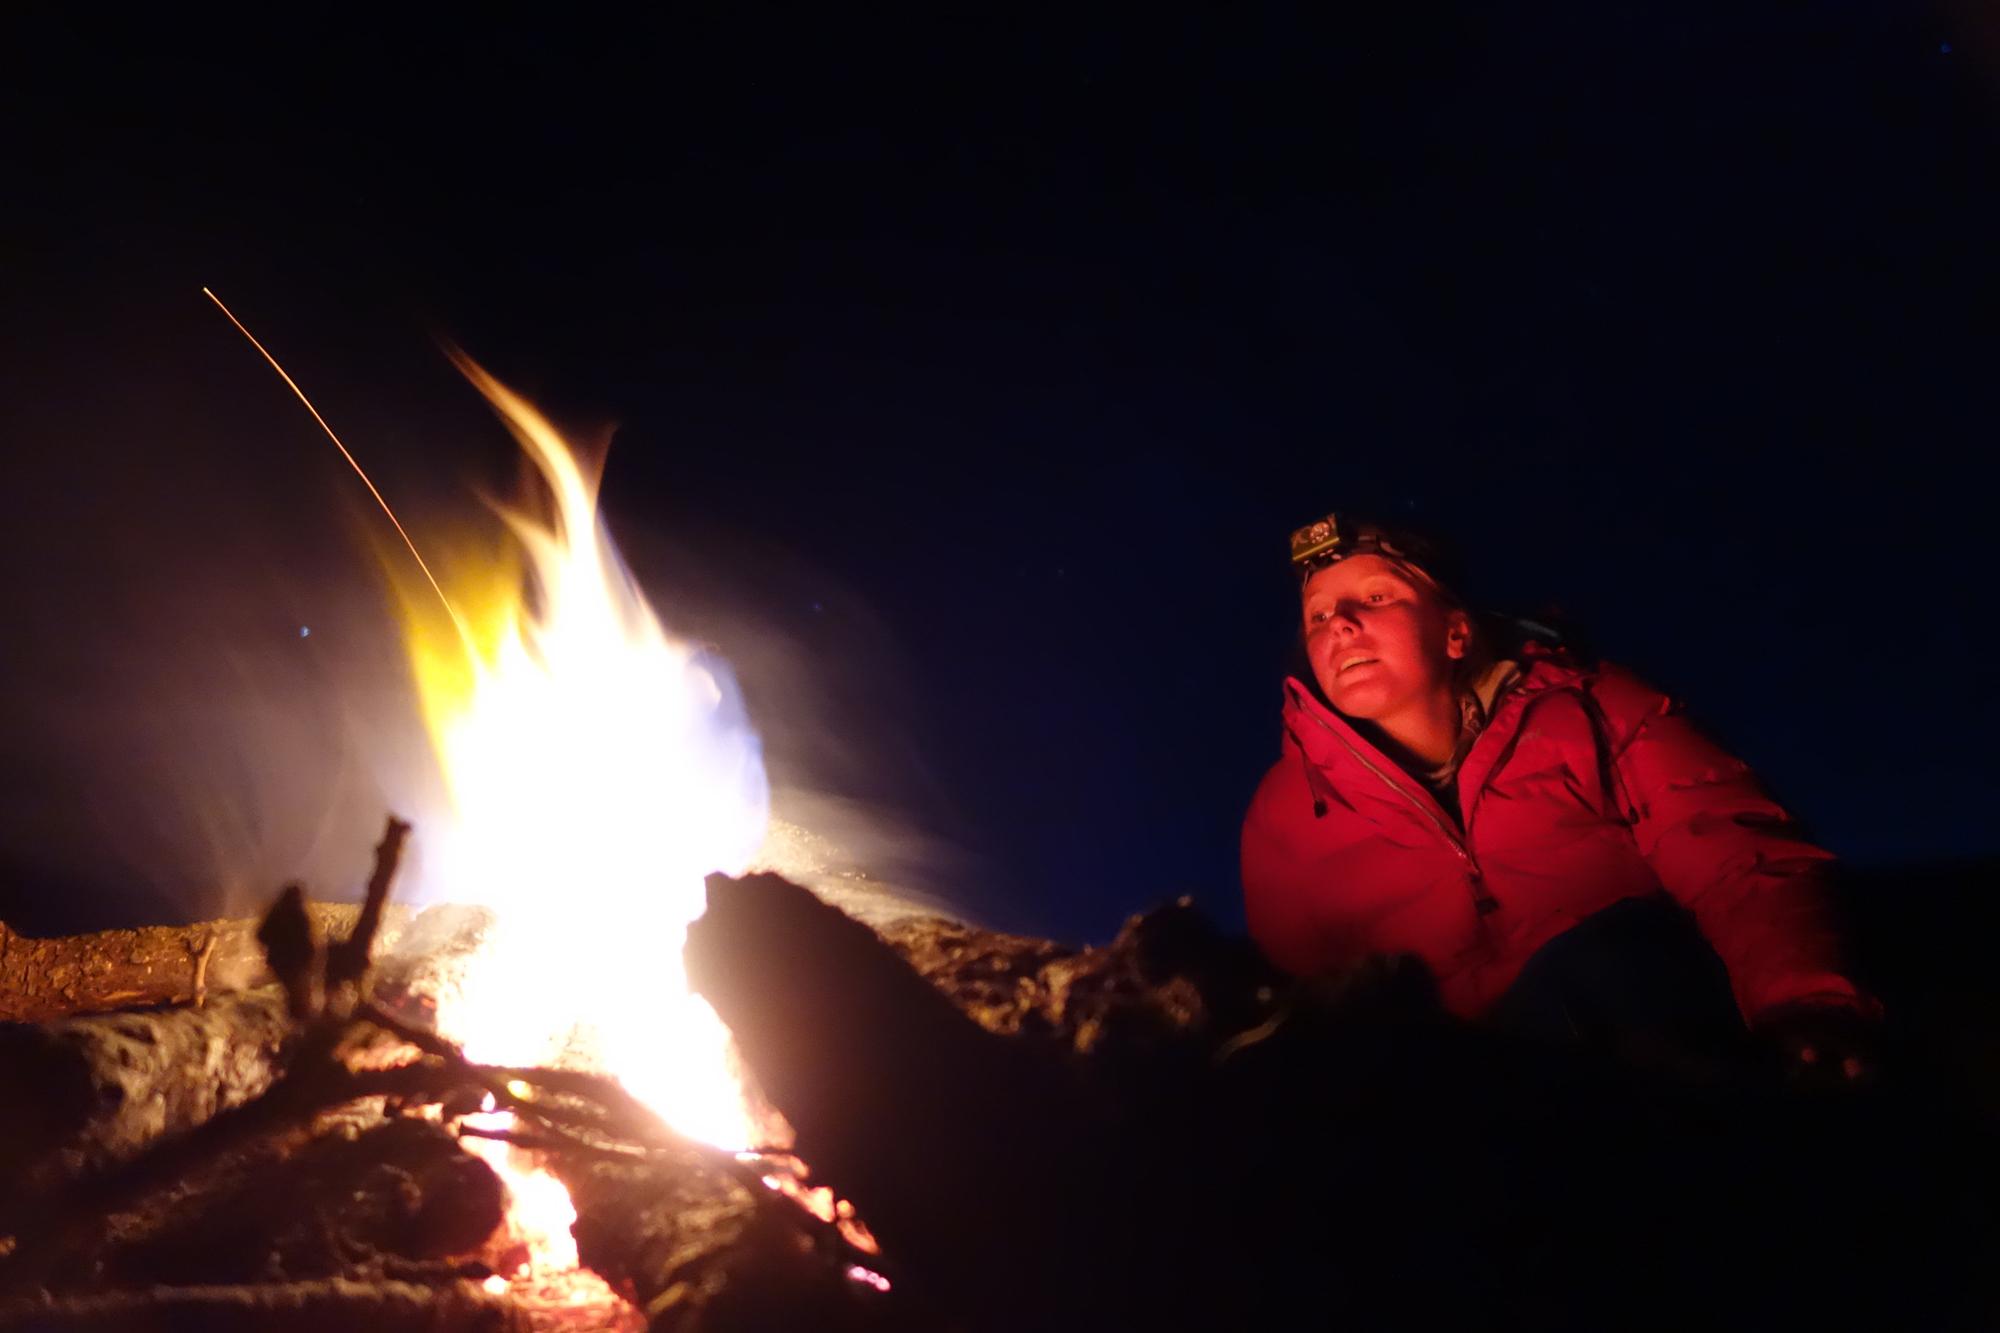 Loraine Humeau feu bivouac The Himalayan Paragliding Line (1 of 1)